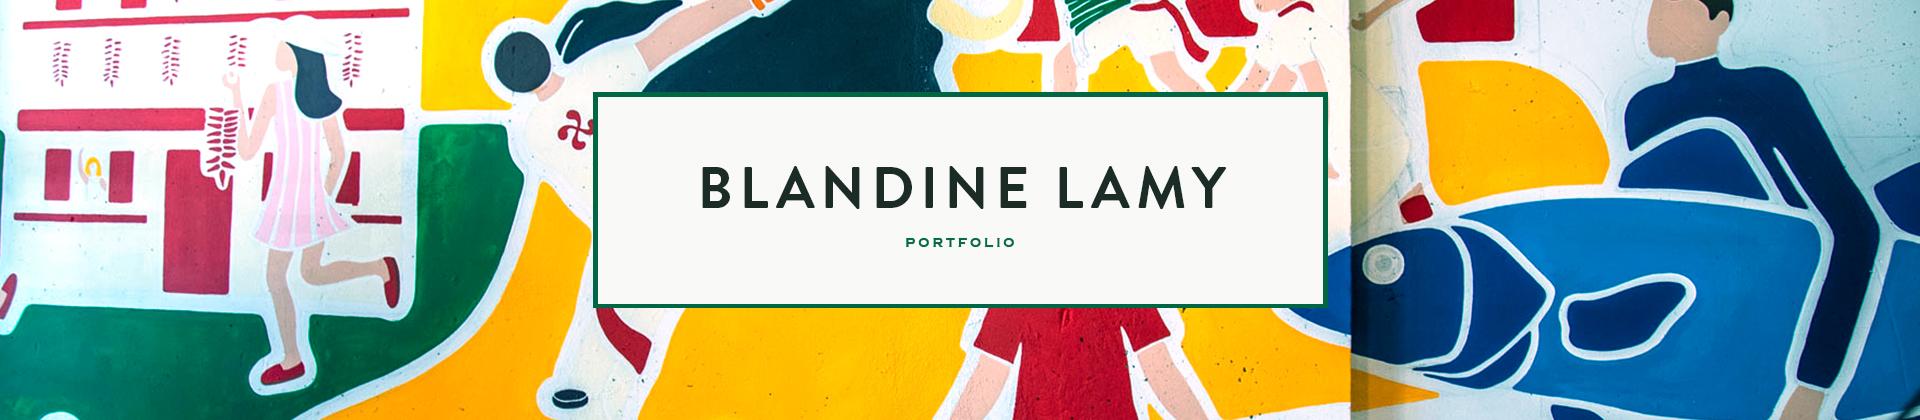 Blandine Lamy